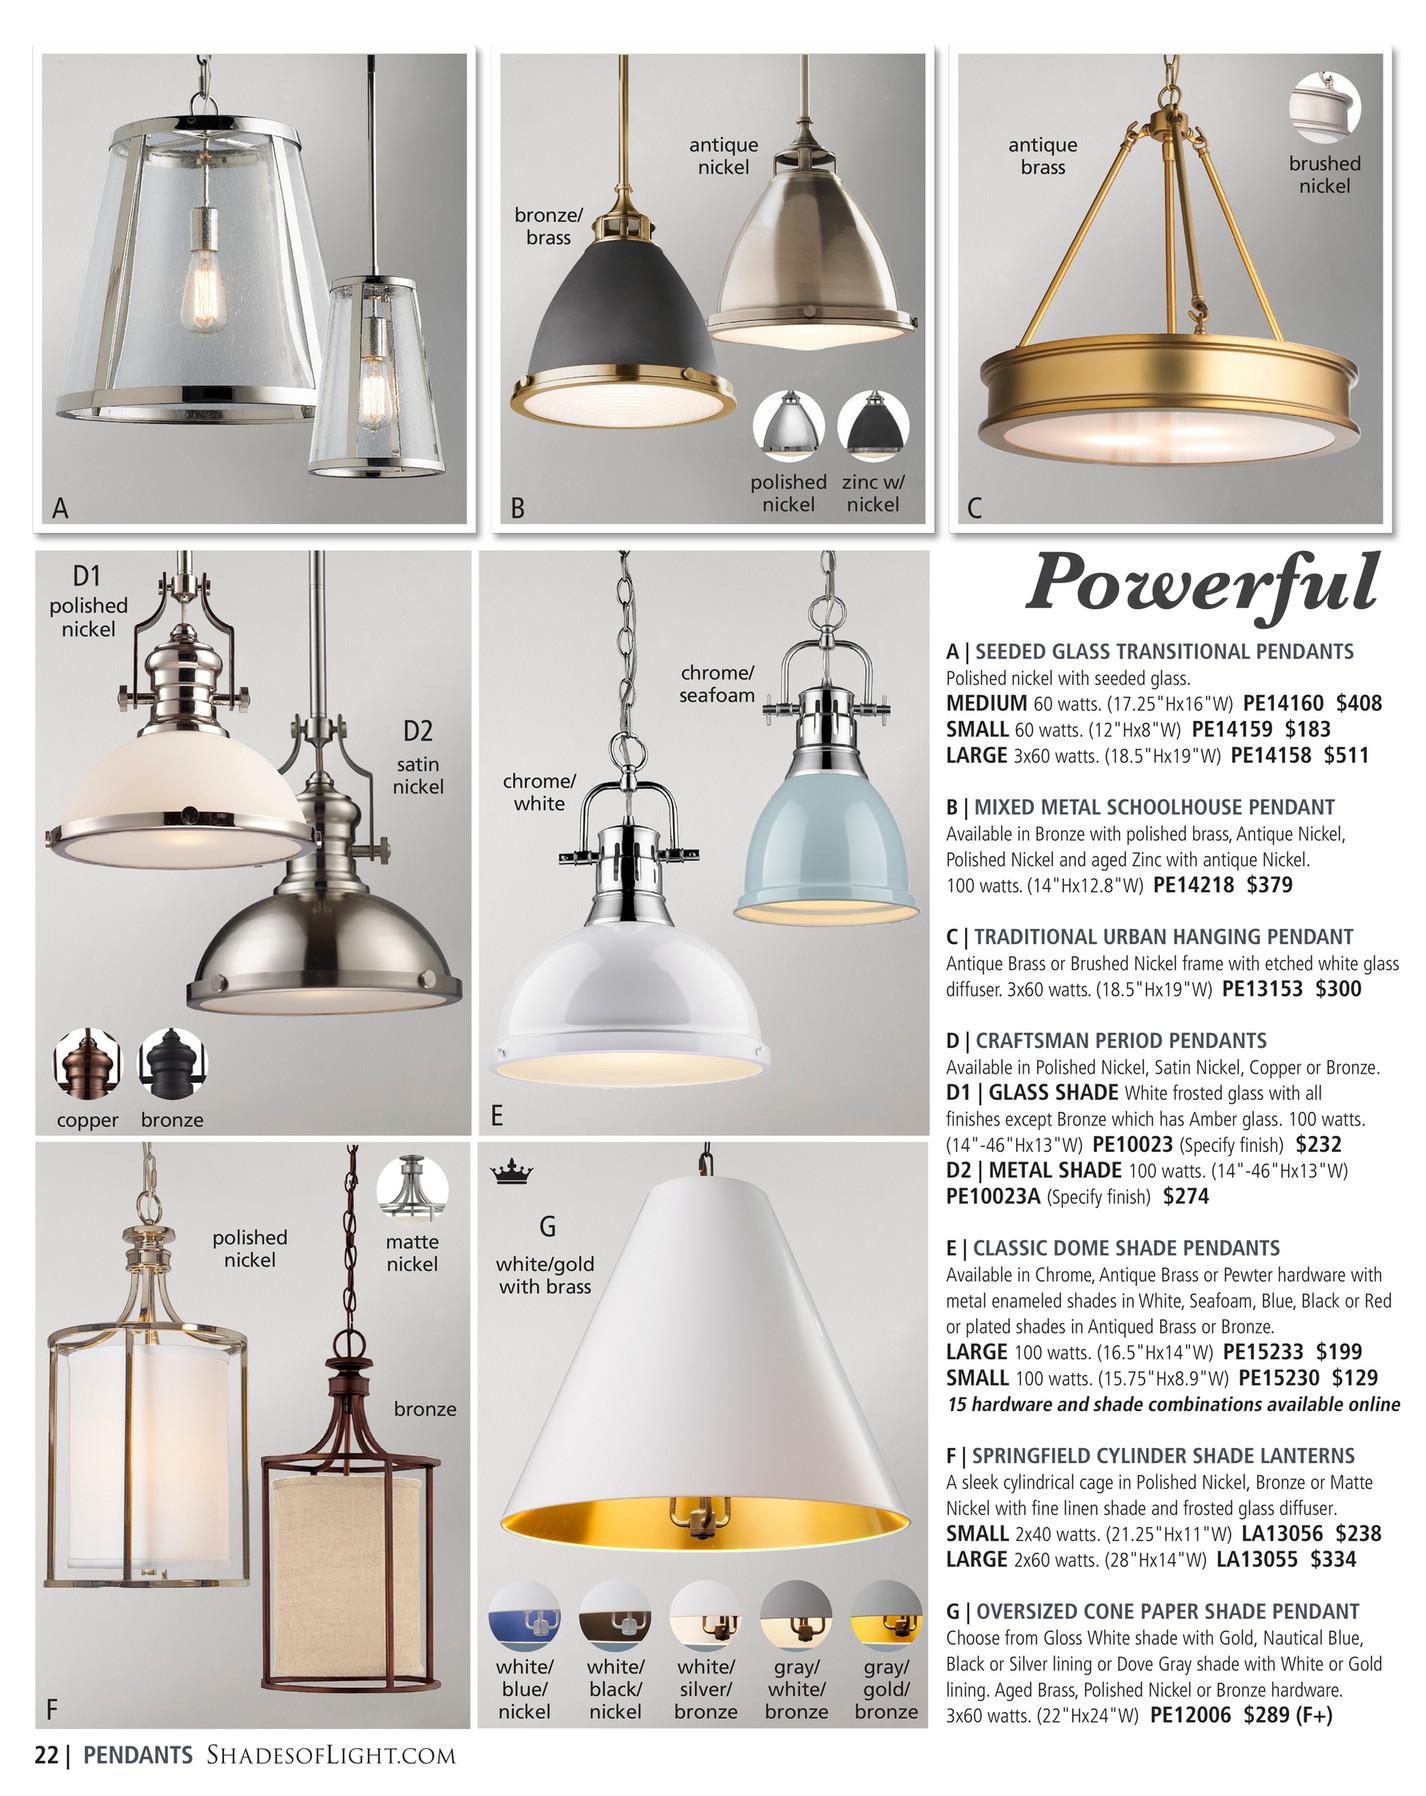 shades of light modern minimalist 2016 page 22 23